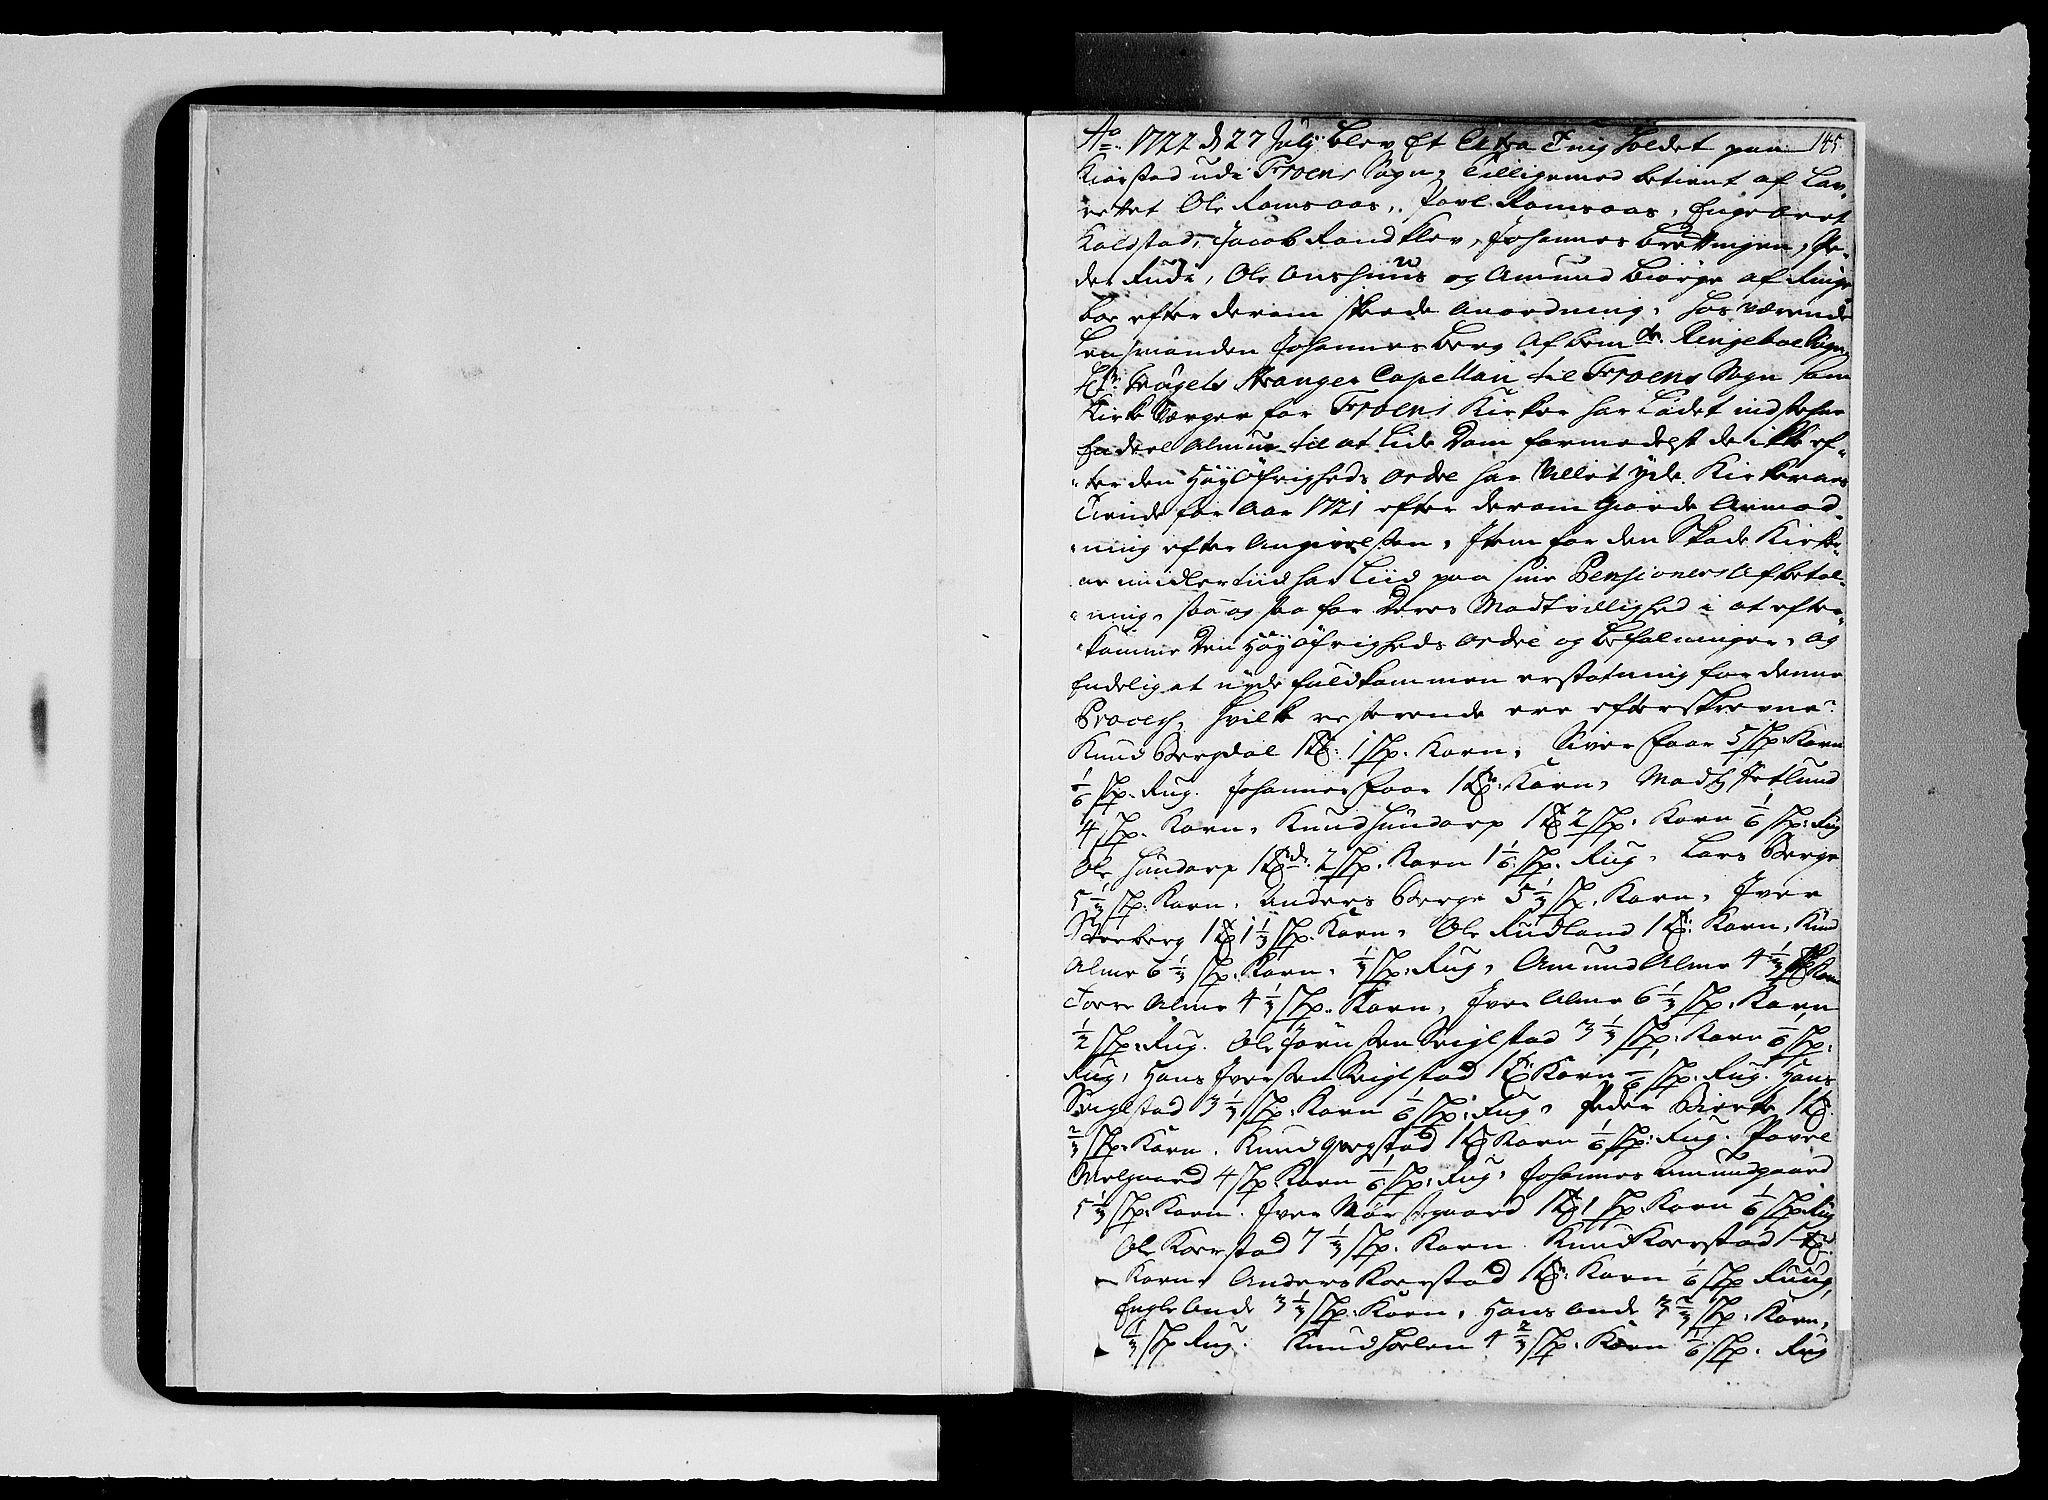 SAH, Sorenskriverier i Gudbrandsdalen, G/Gb/Gbc/L0008: Tingbok - Nord- og Sør-Gudbrandsdal, 1722-1725, s. 144b-145a